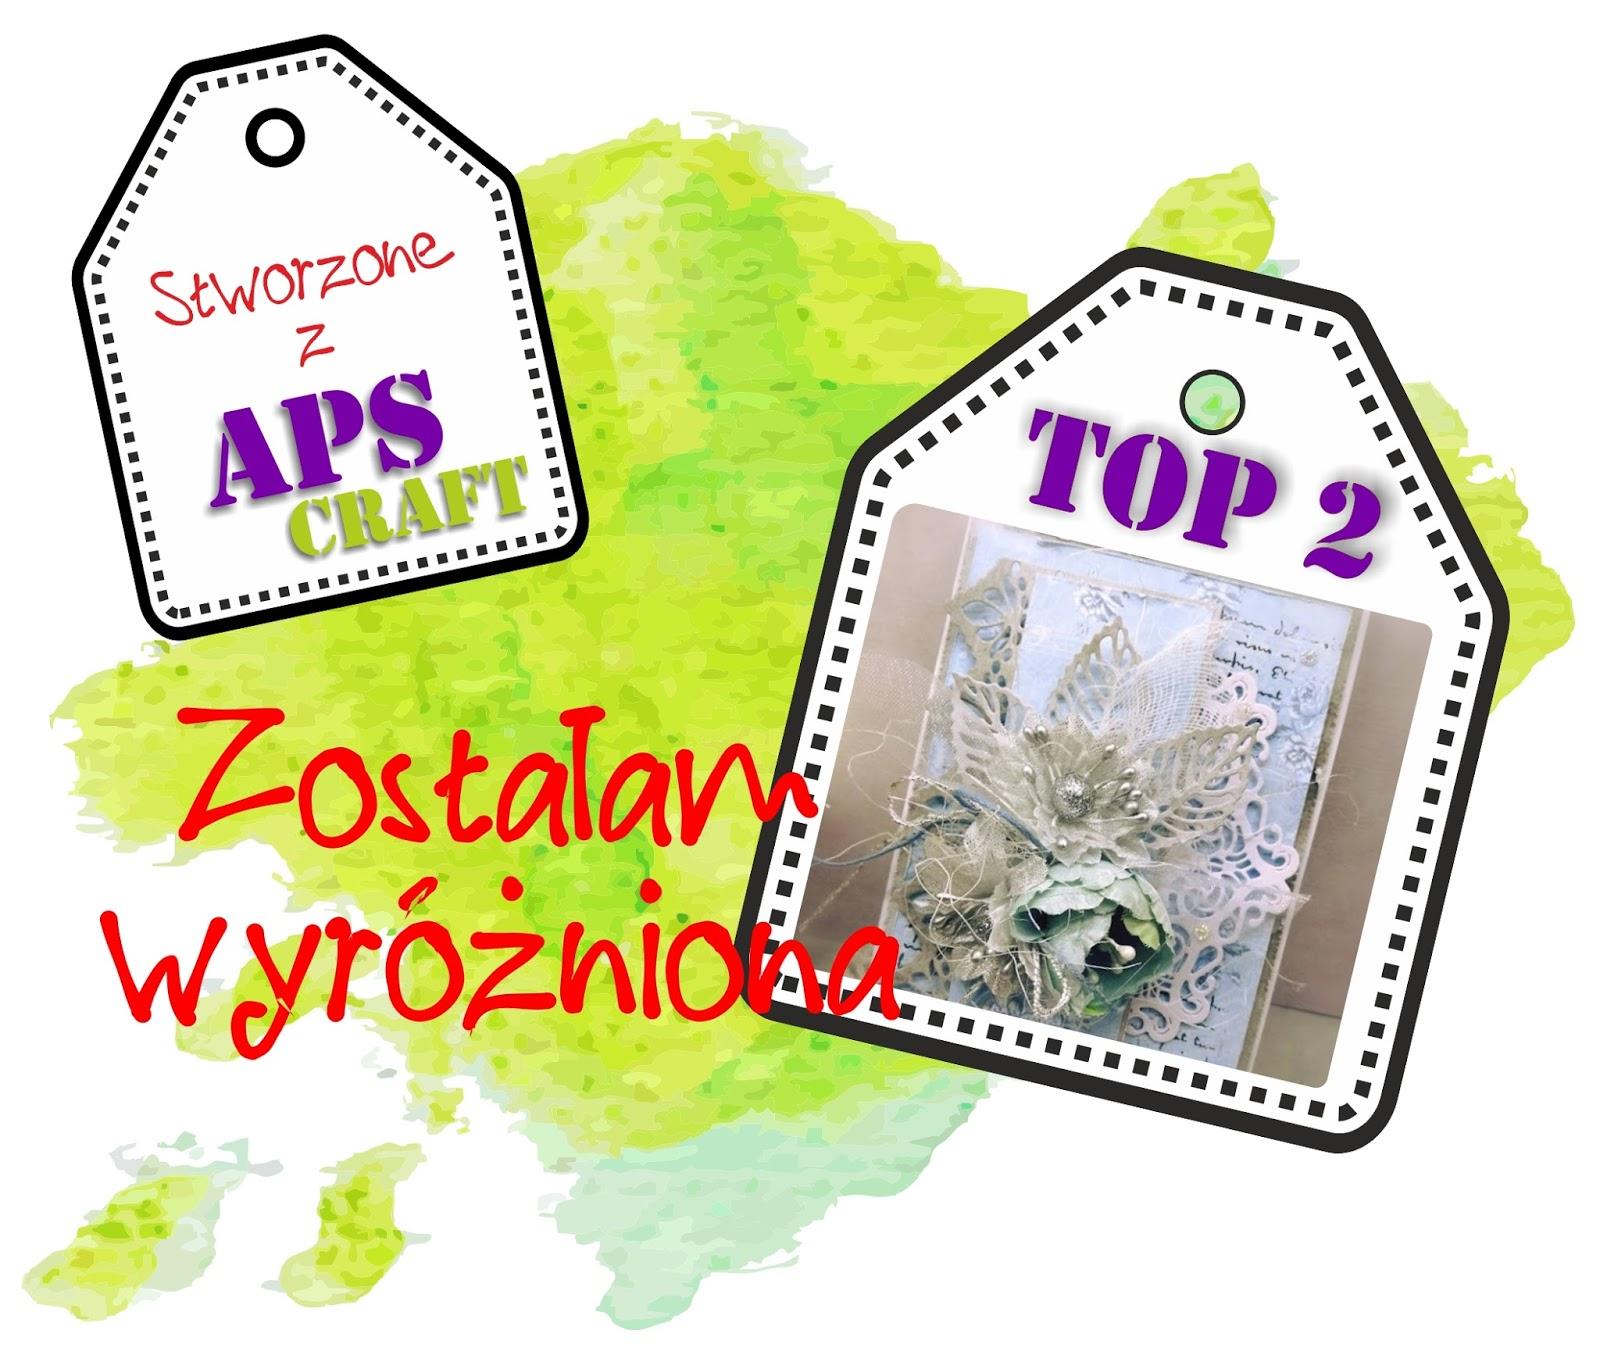 TOP 2 w APS